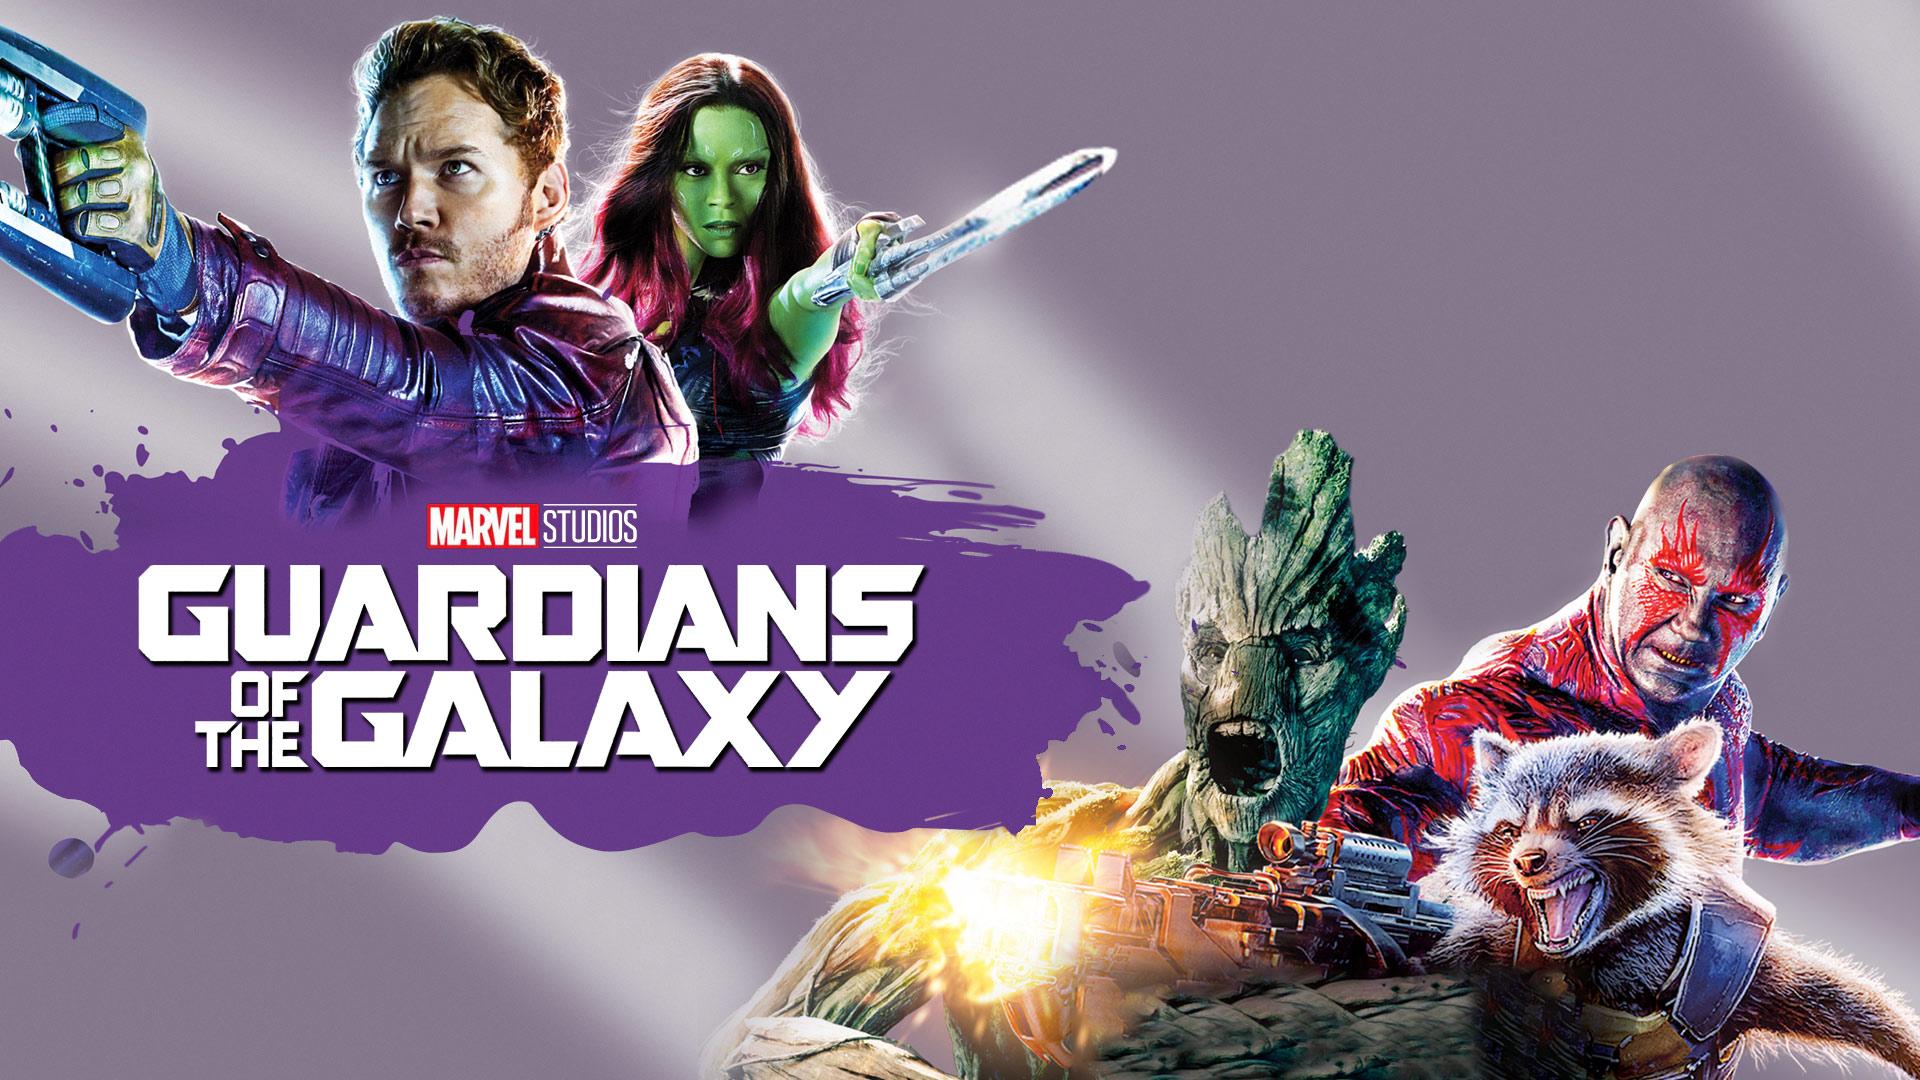 Marvel Studios' Guardians of the Galaxy (4K UHD)